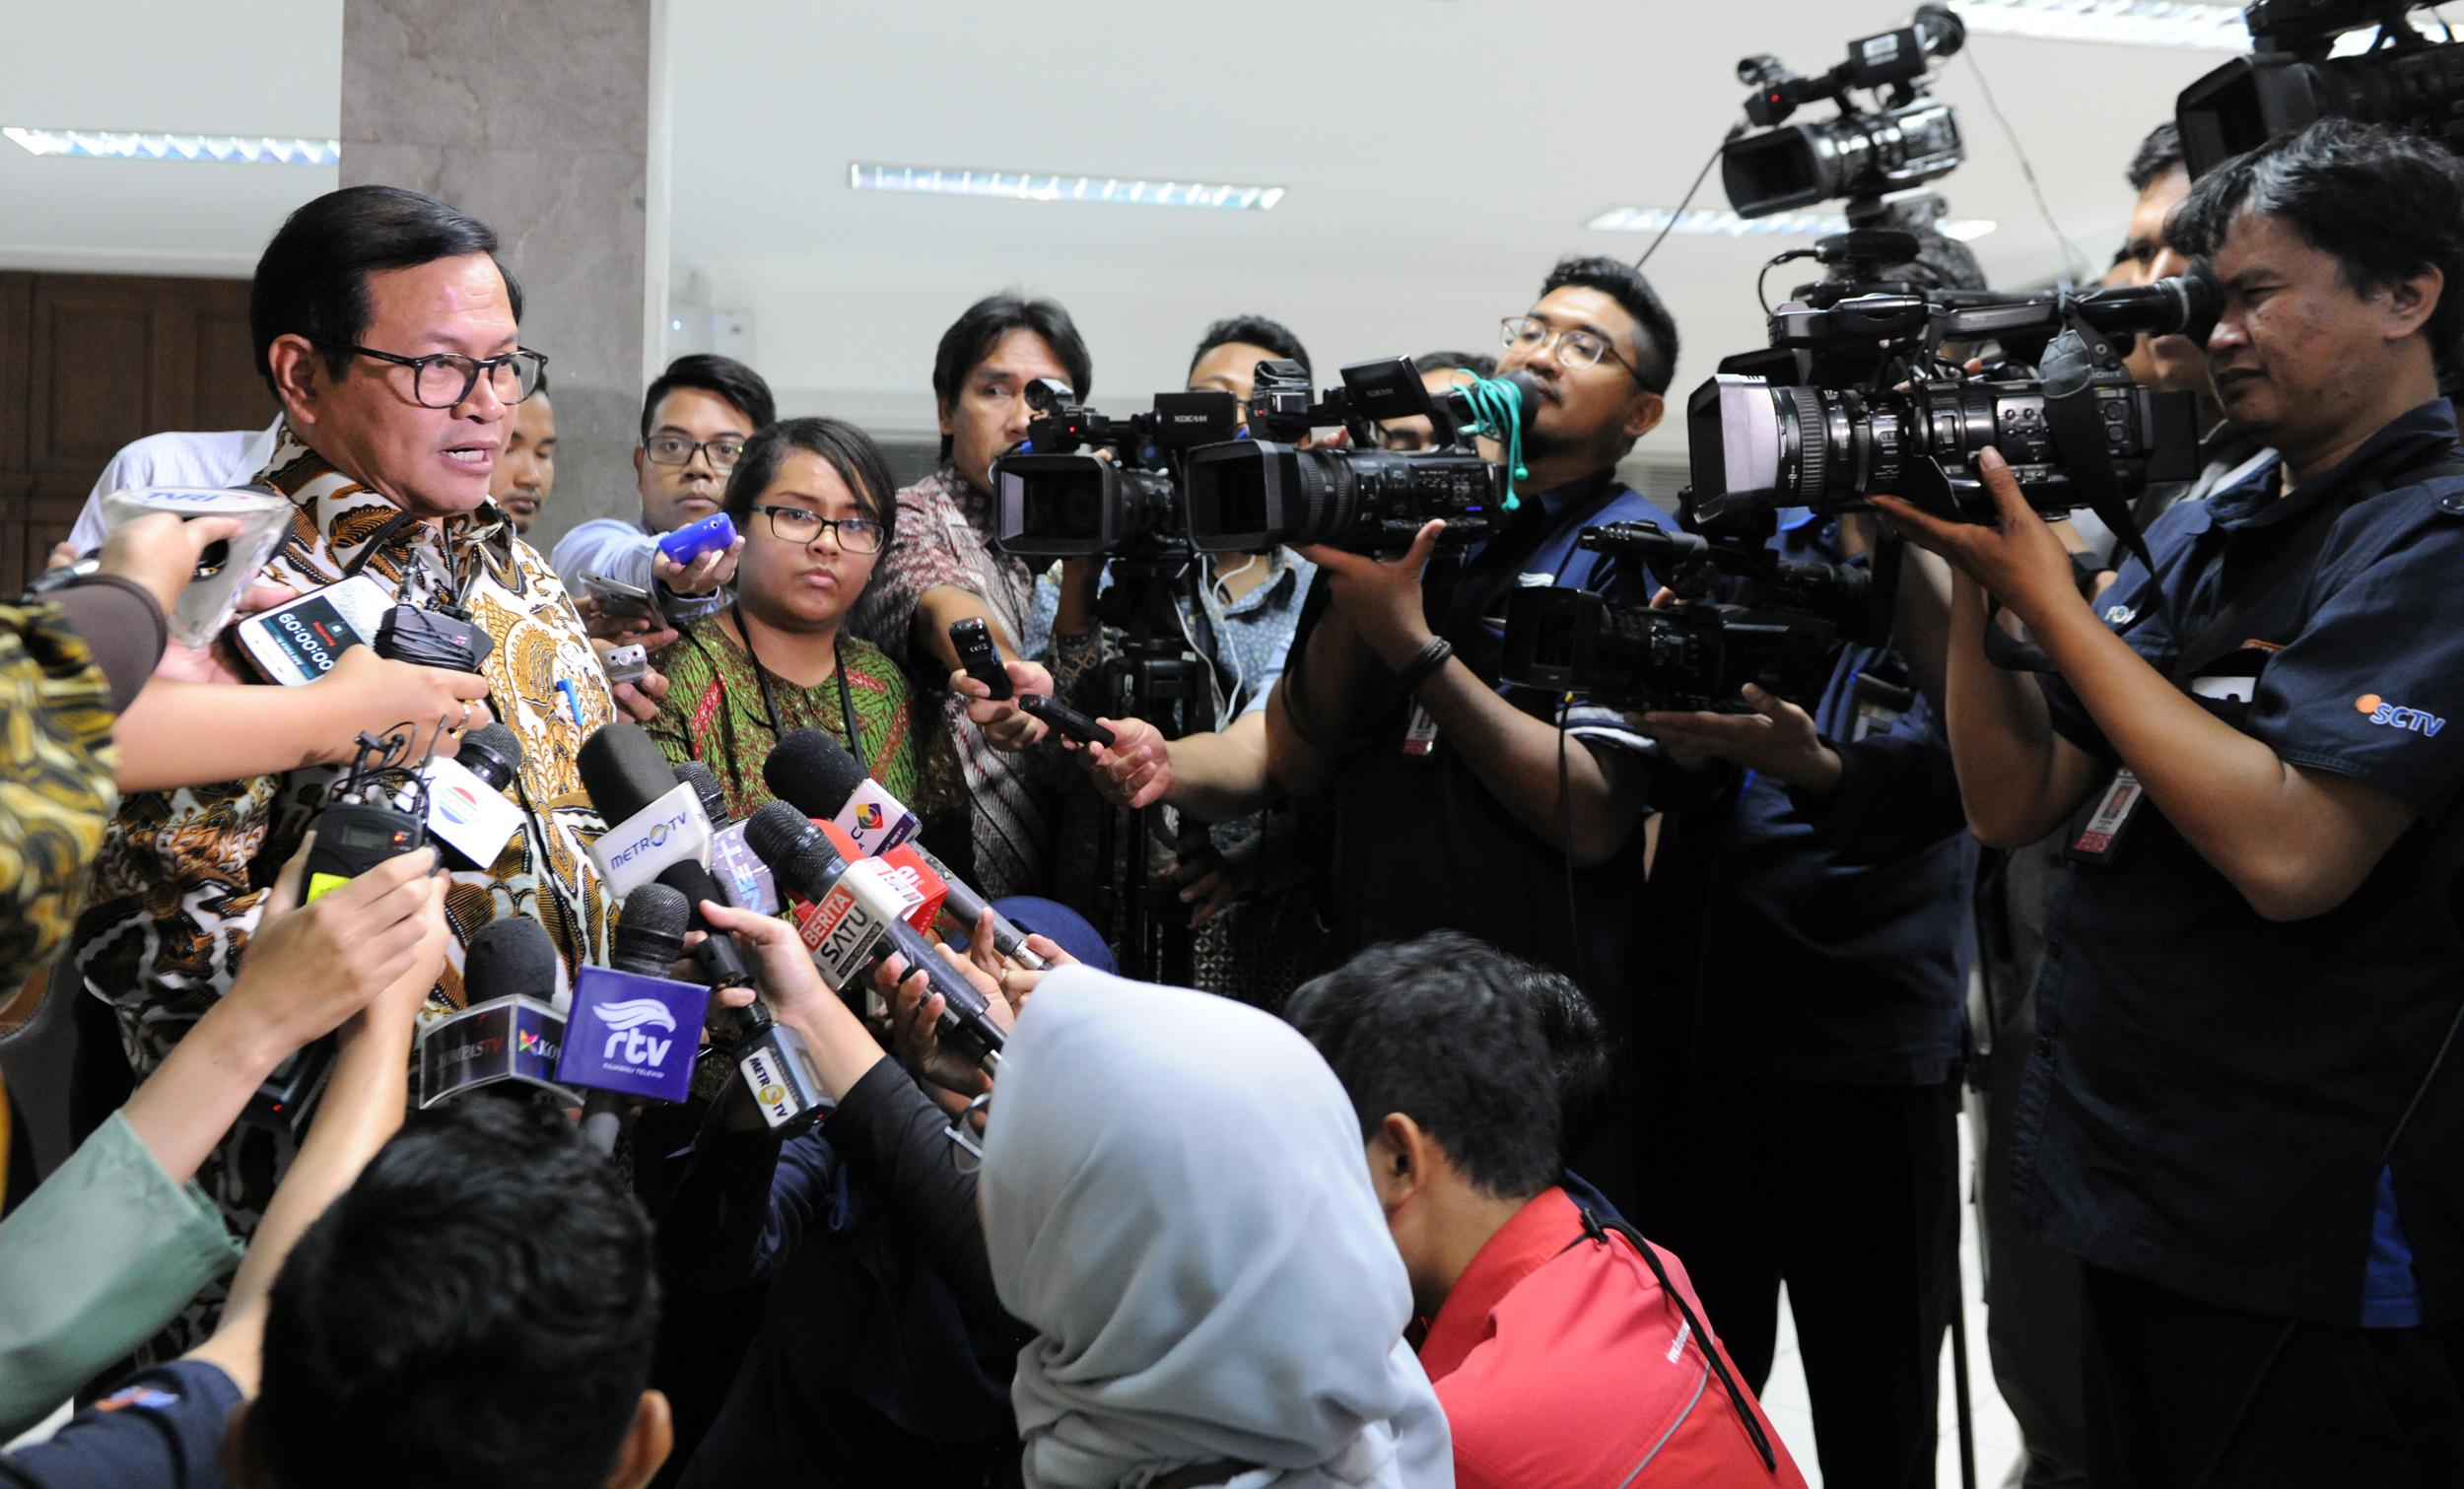 Seskab, Pramono Anung, menjawab pertanyaan wartawan usai Rapat Terbatas, di Kantor Presiden, Jakarta, Rabu (22/3). (Foto: Humas/Rahmat)